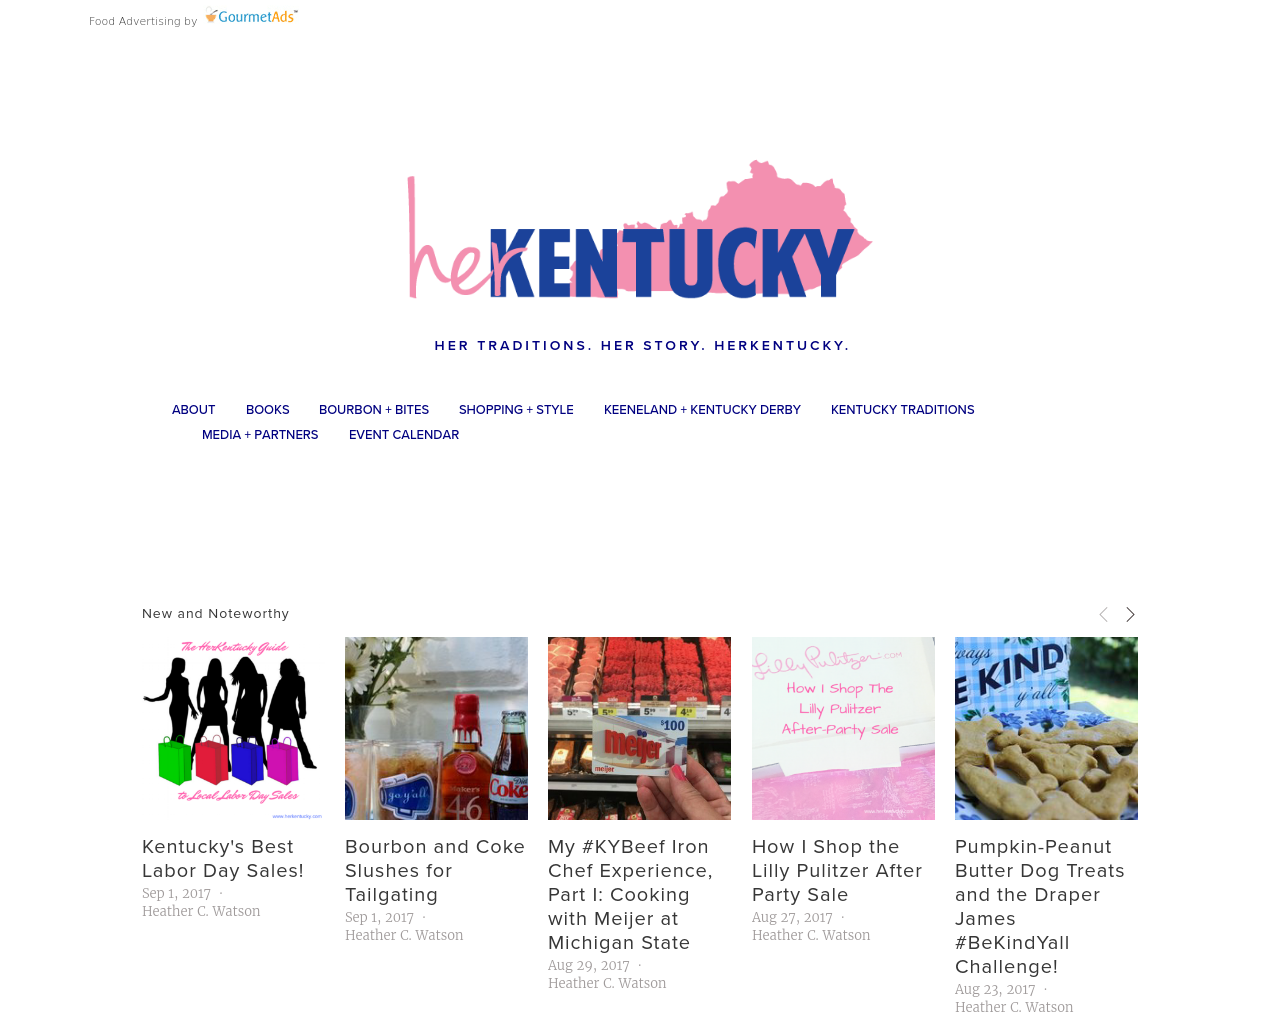 HerKentucky-Advertising-Reviews-Pricing